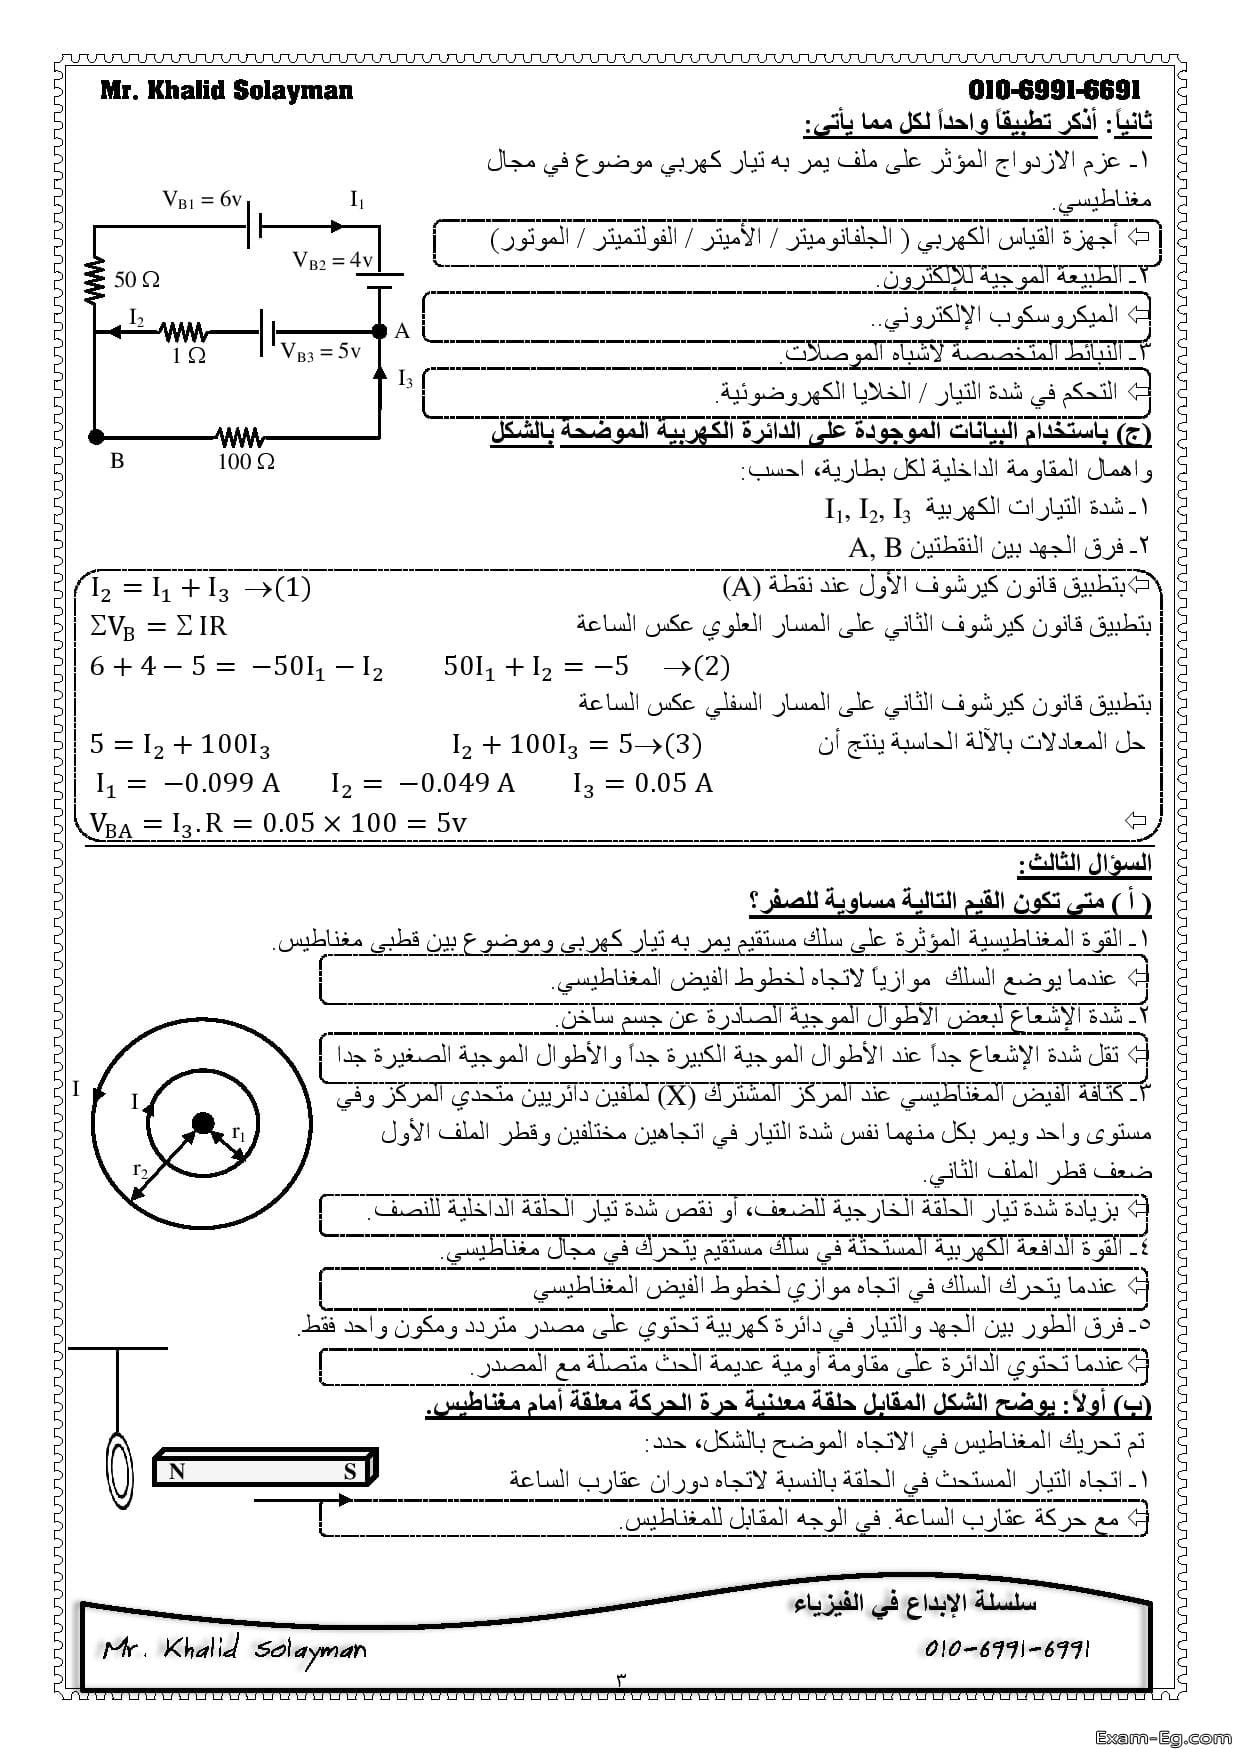 exam-eg.com_155647056841393.jpg